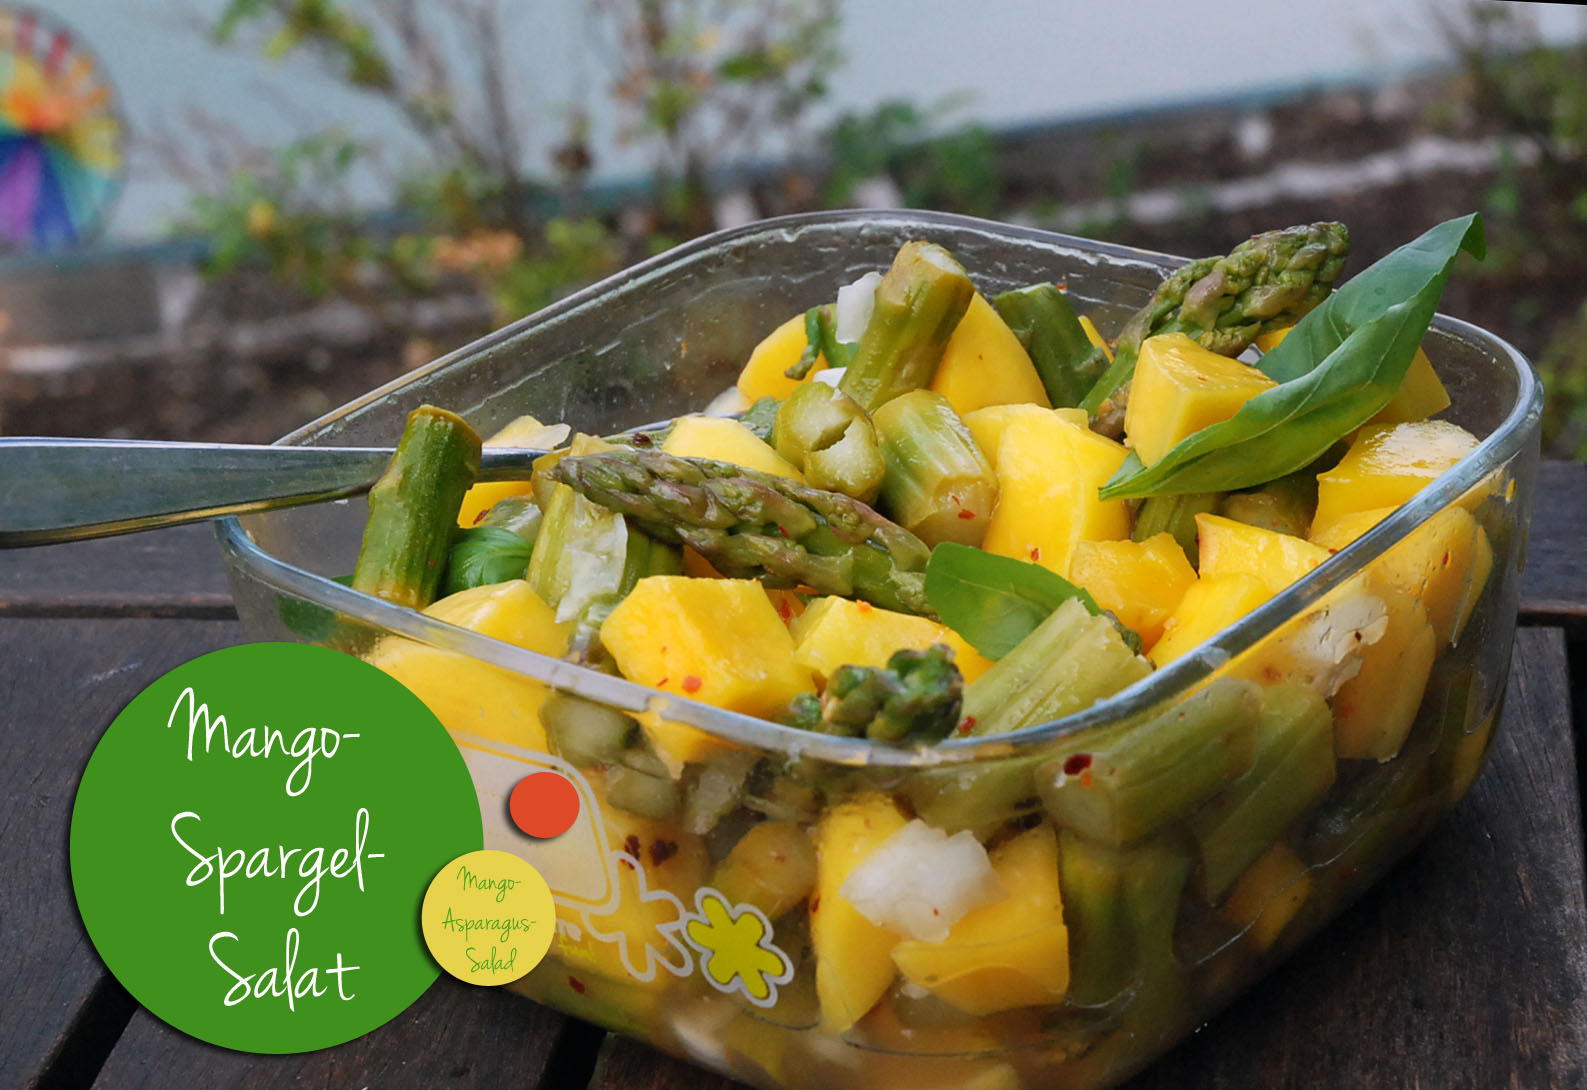 Mango Spargel Salat / Mango asparagus salad